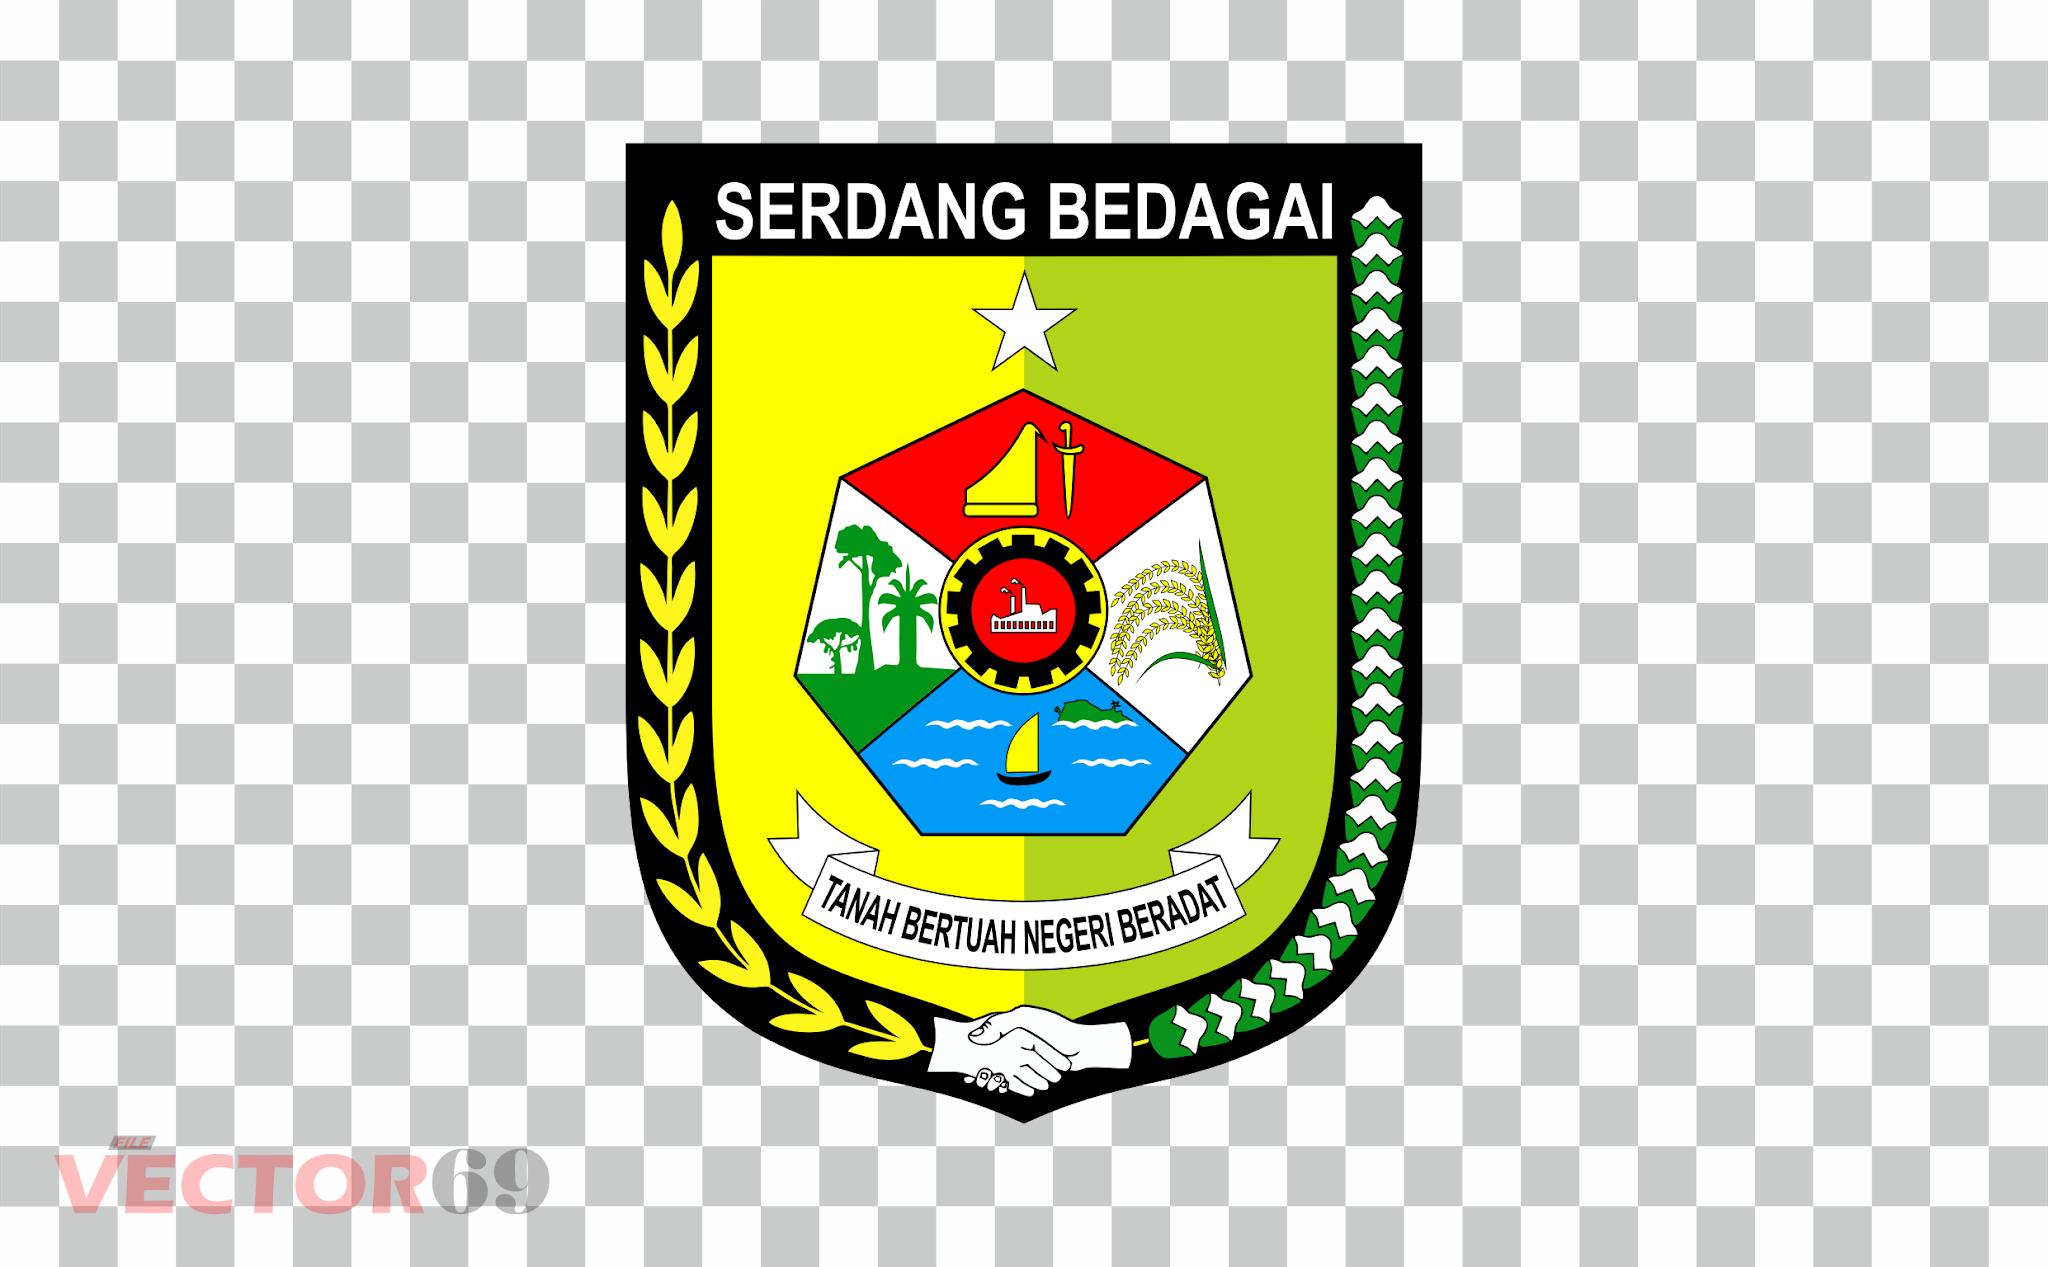 Kabupaten Serdang Bedagai Logo - Download Vector File PNG (Portable Network Graphics)